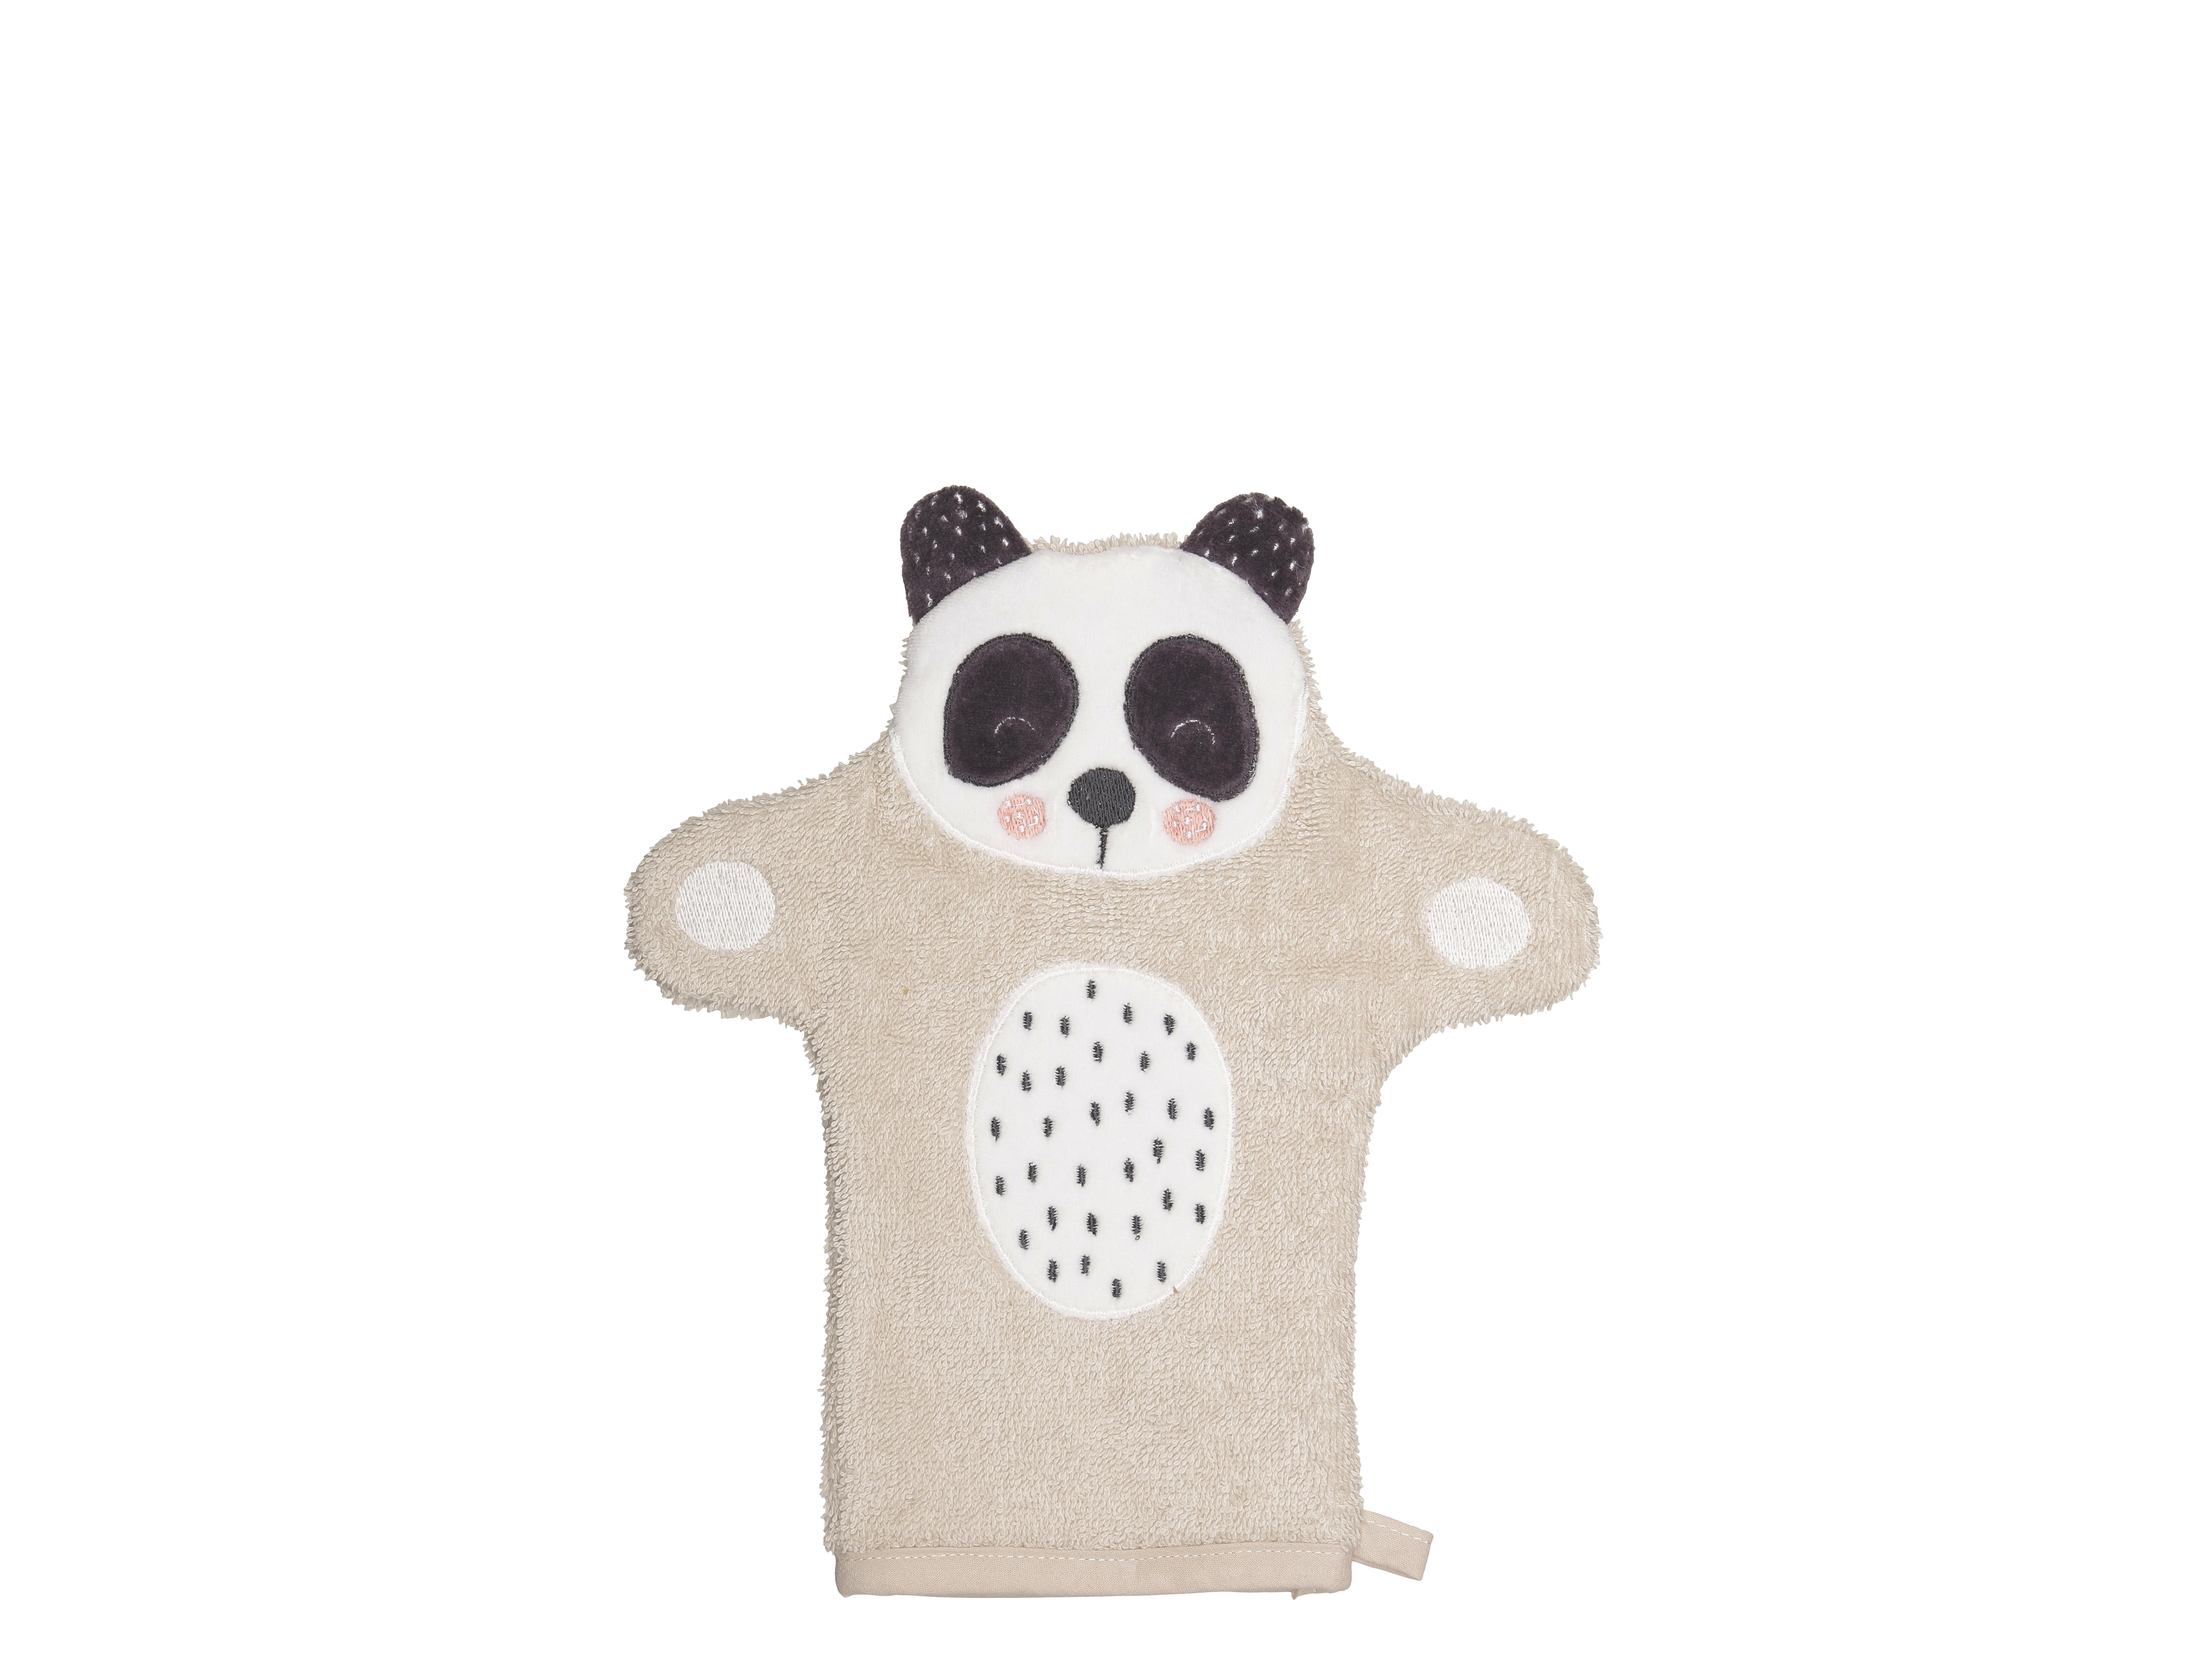 Södahl Penny Panda vaskehandske, 11x21 cm, natur